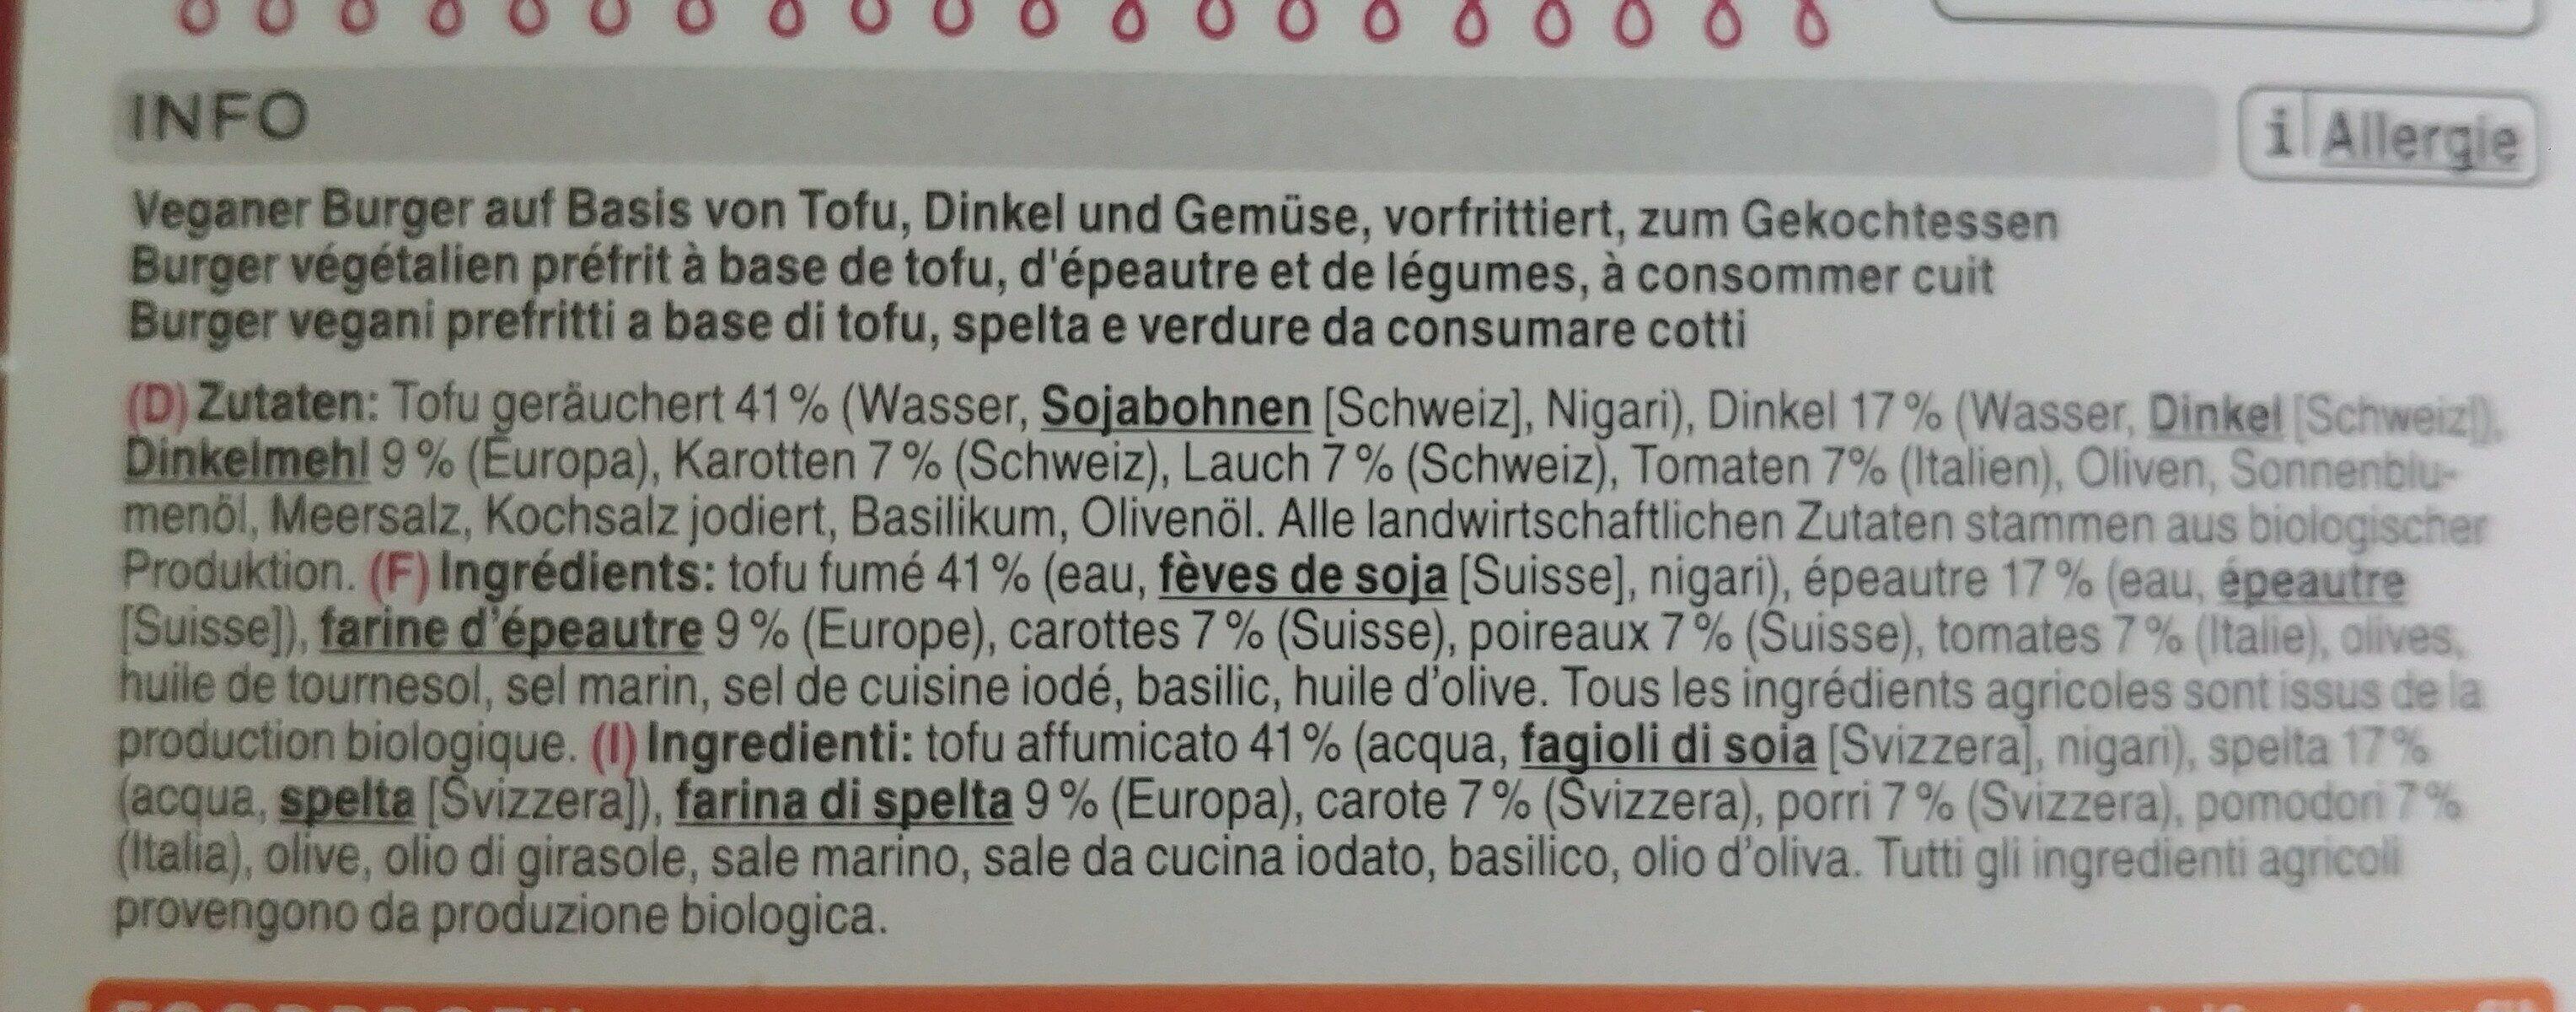 Bio Tofu Burger - Ingrédients